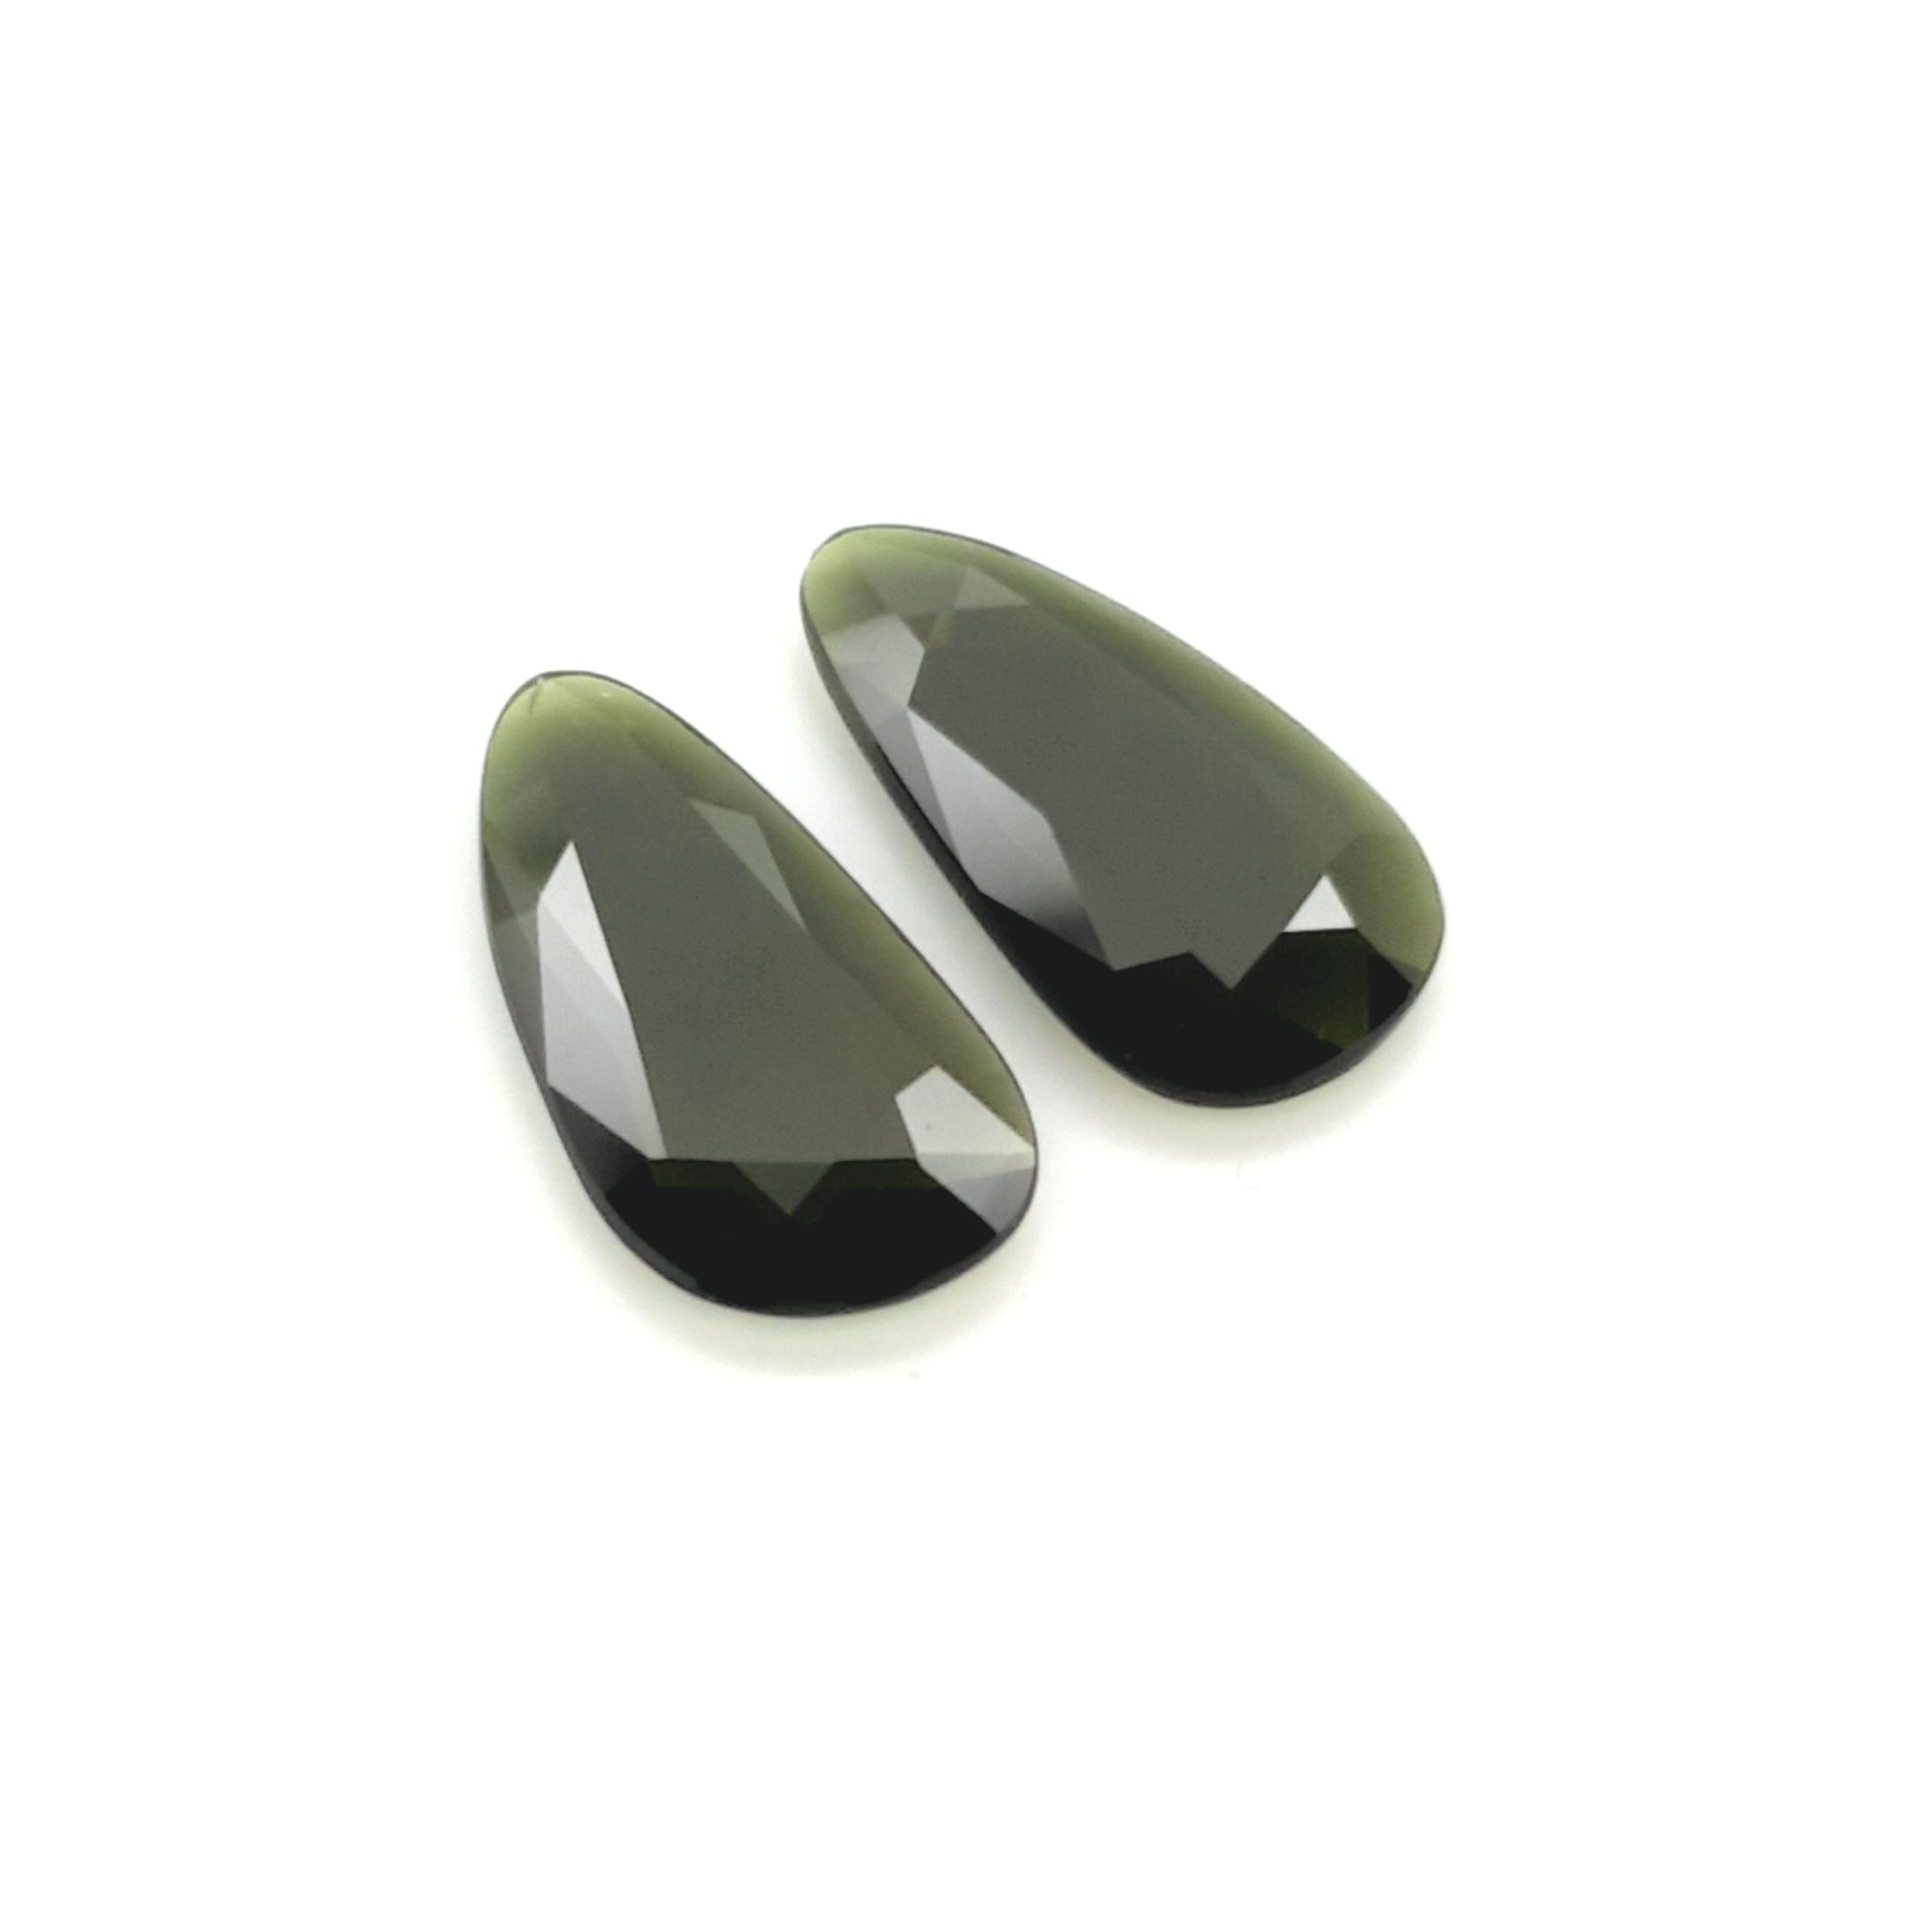 5,65ct.Pair Imperial Green Tourmalin DoubleRoseCut TMJ18C3 ClaudiaHamann__2021-02-11-22-45-15